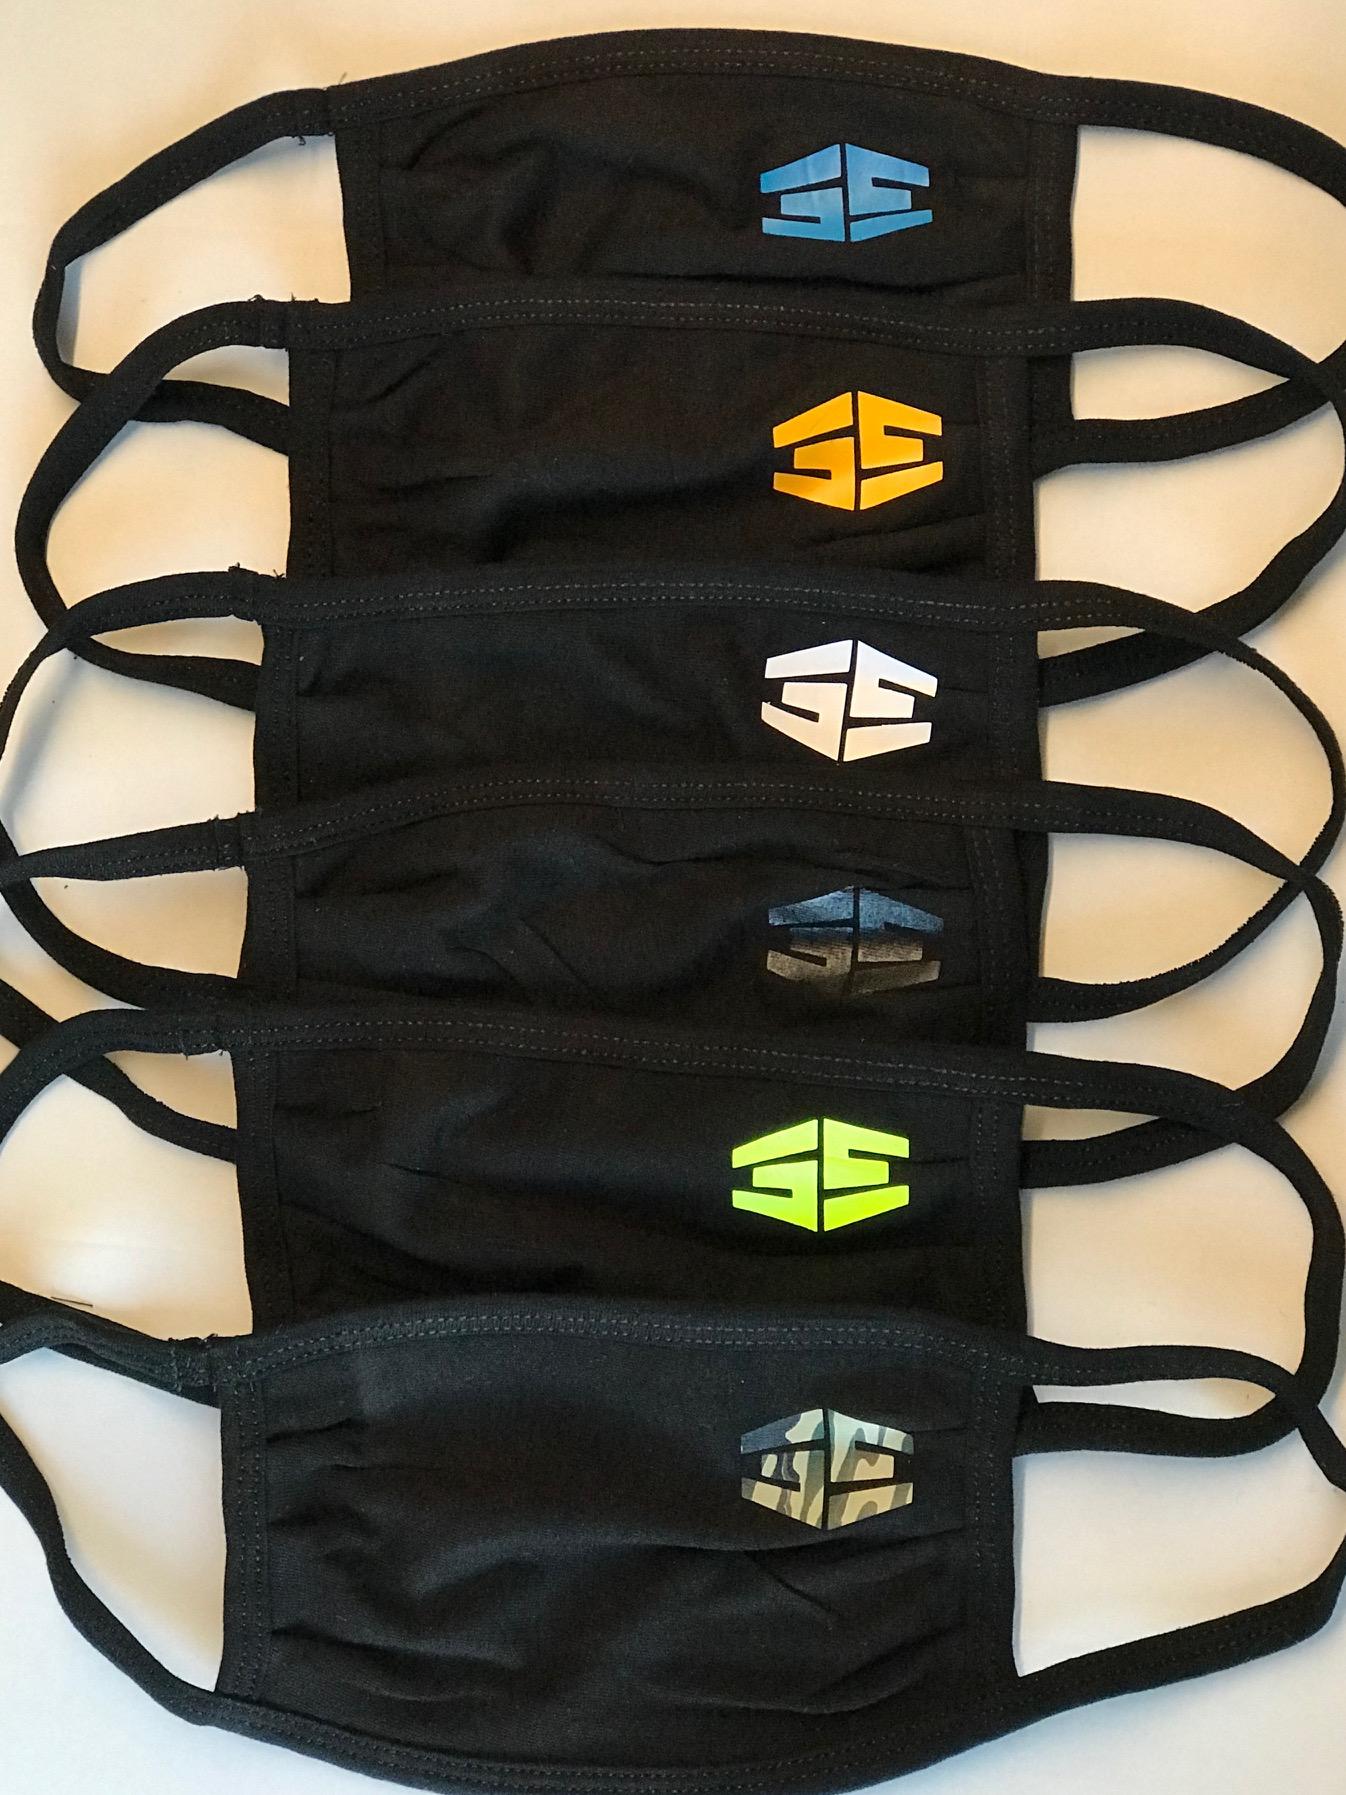 35th Ave Tron Logo Masks